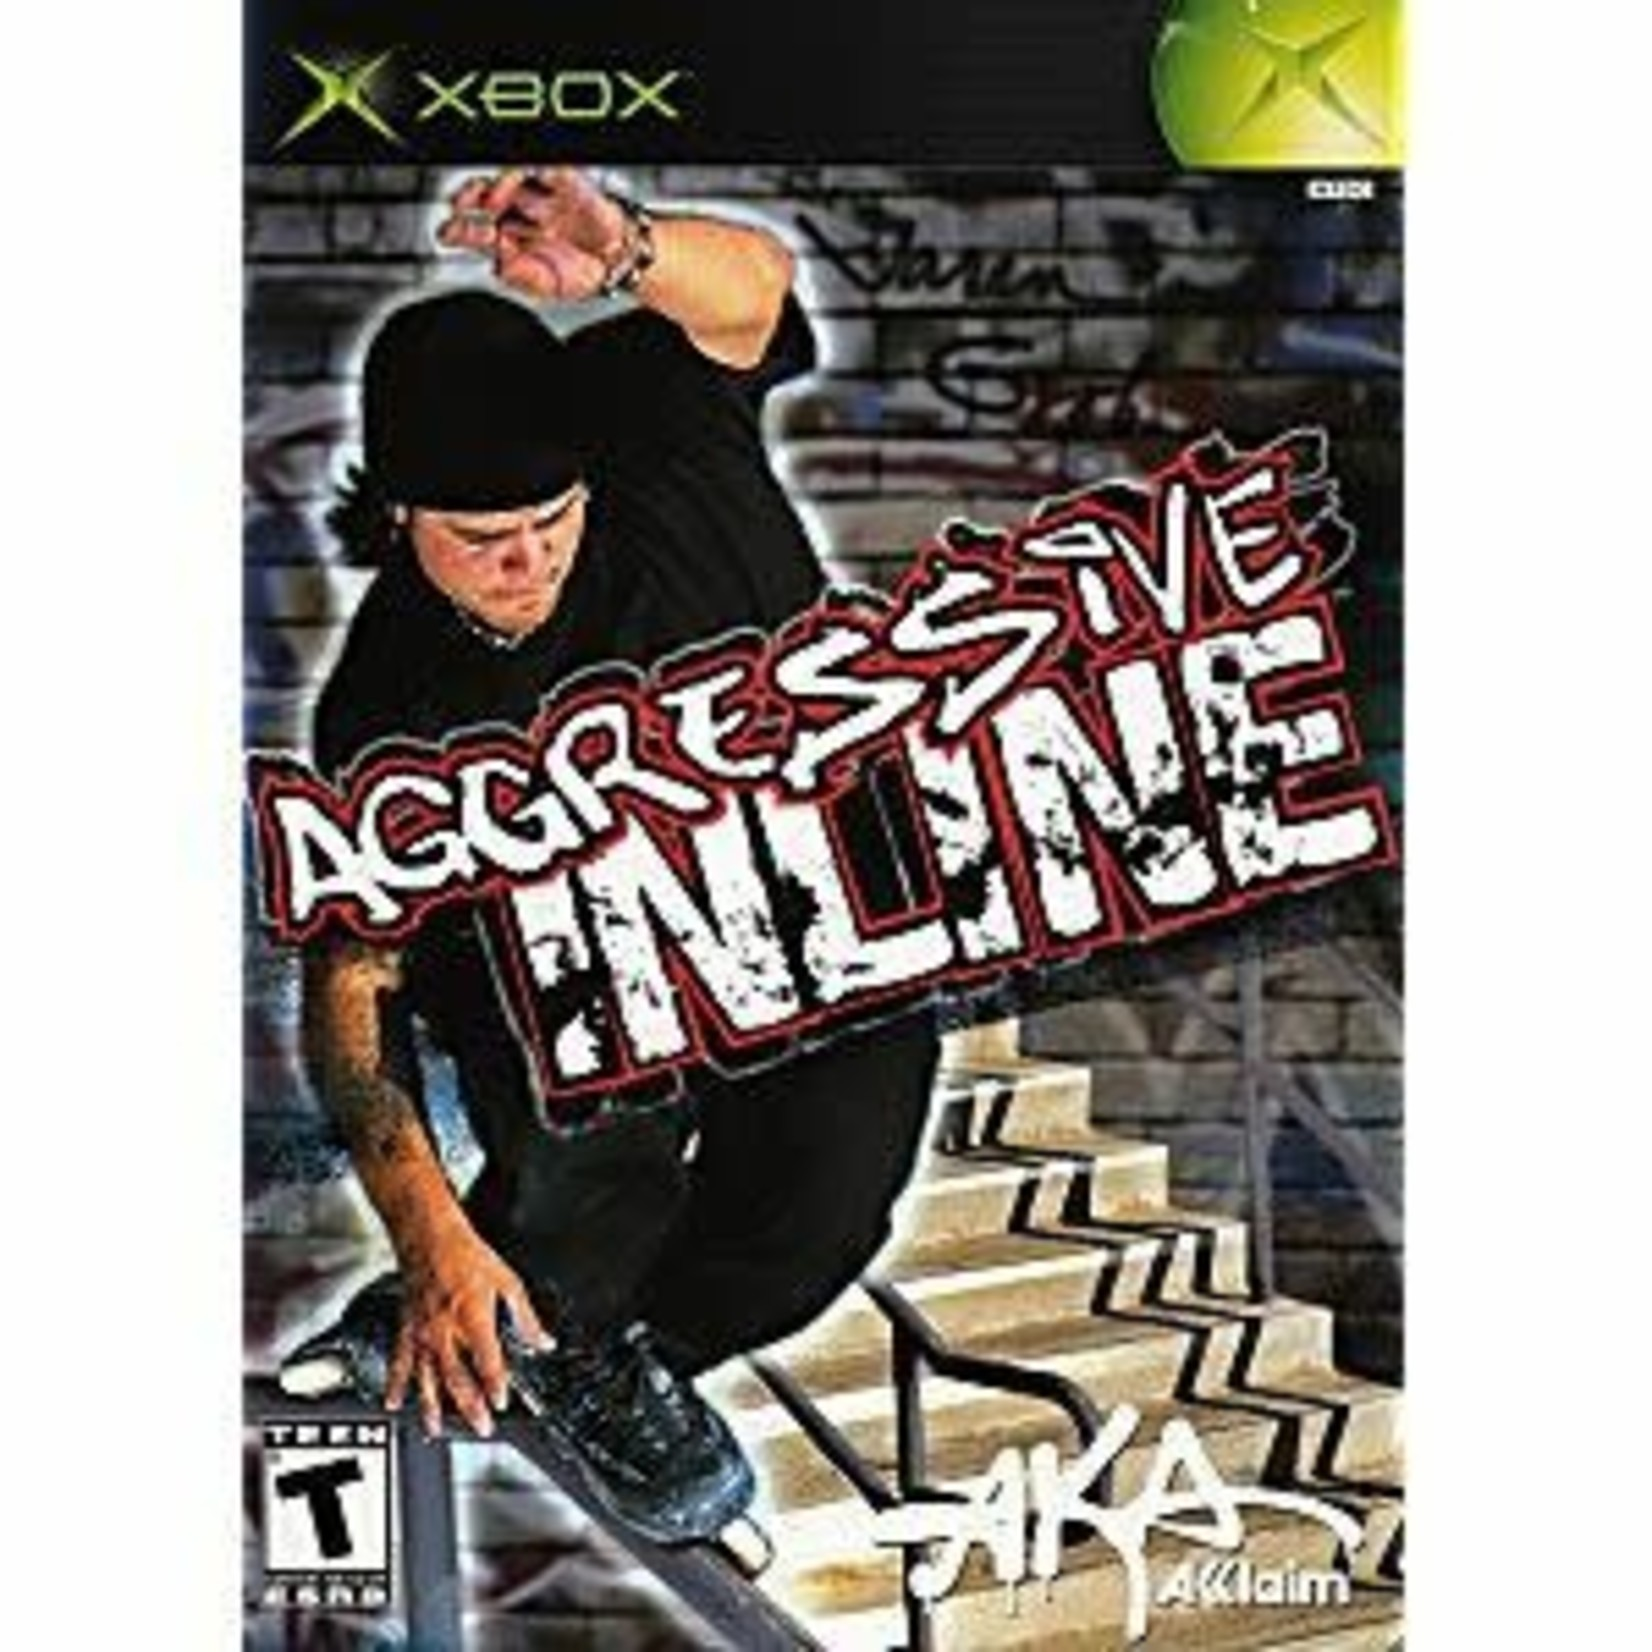 XBU-Aggressive Inline